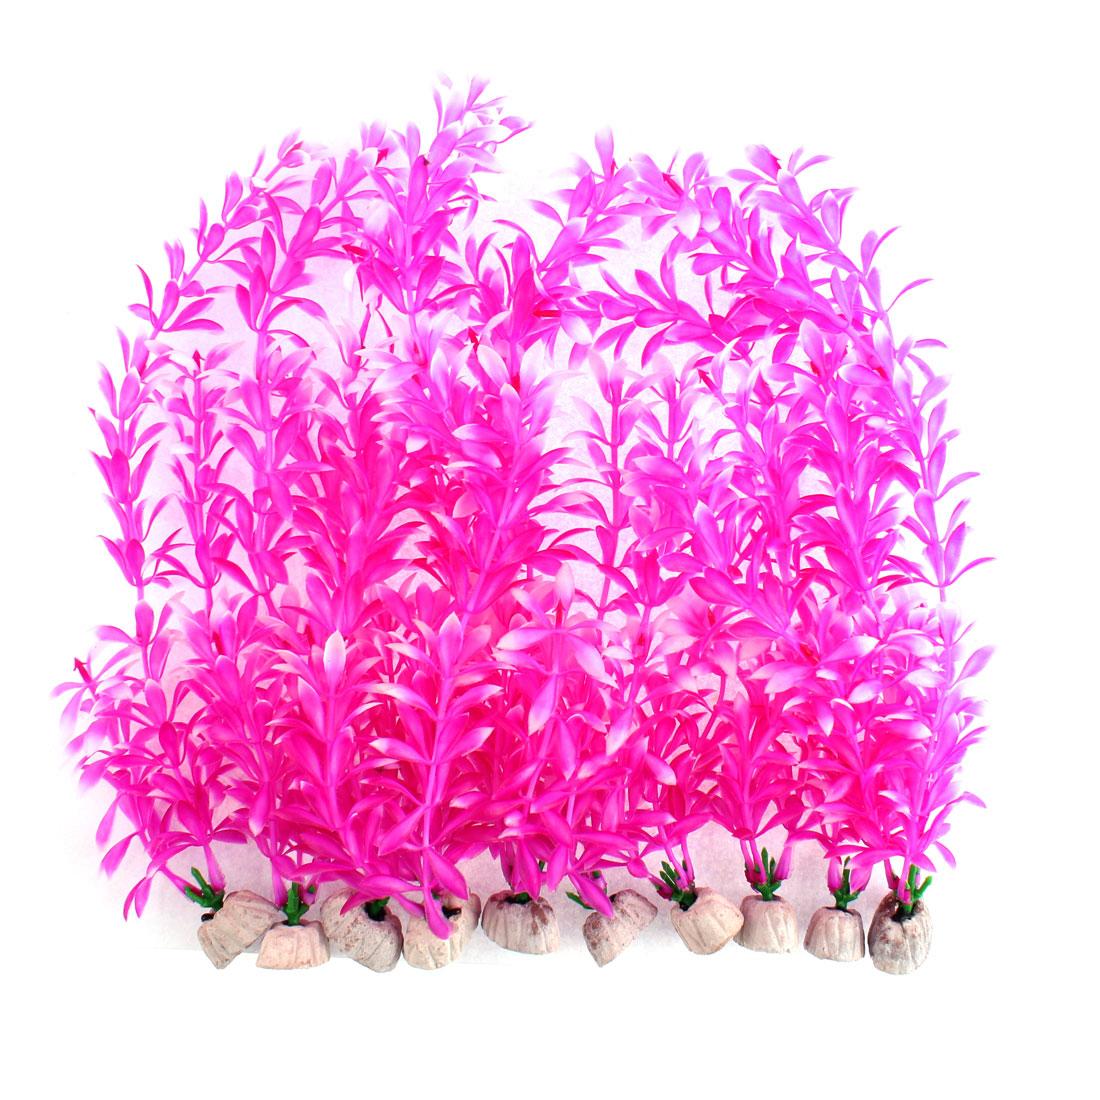 Aquarium Plastic Artificial Underwater Plant Grass Decor Purple 29cm Heigt 10pcs